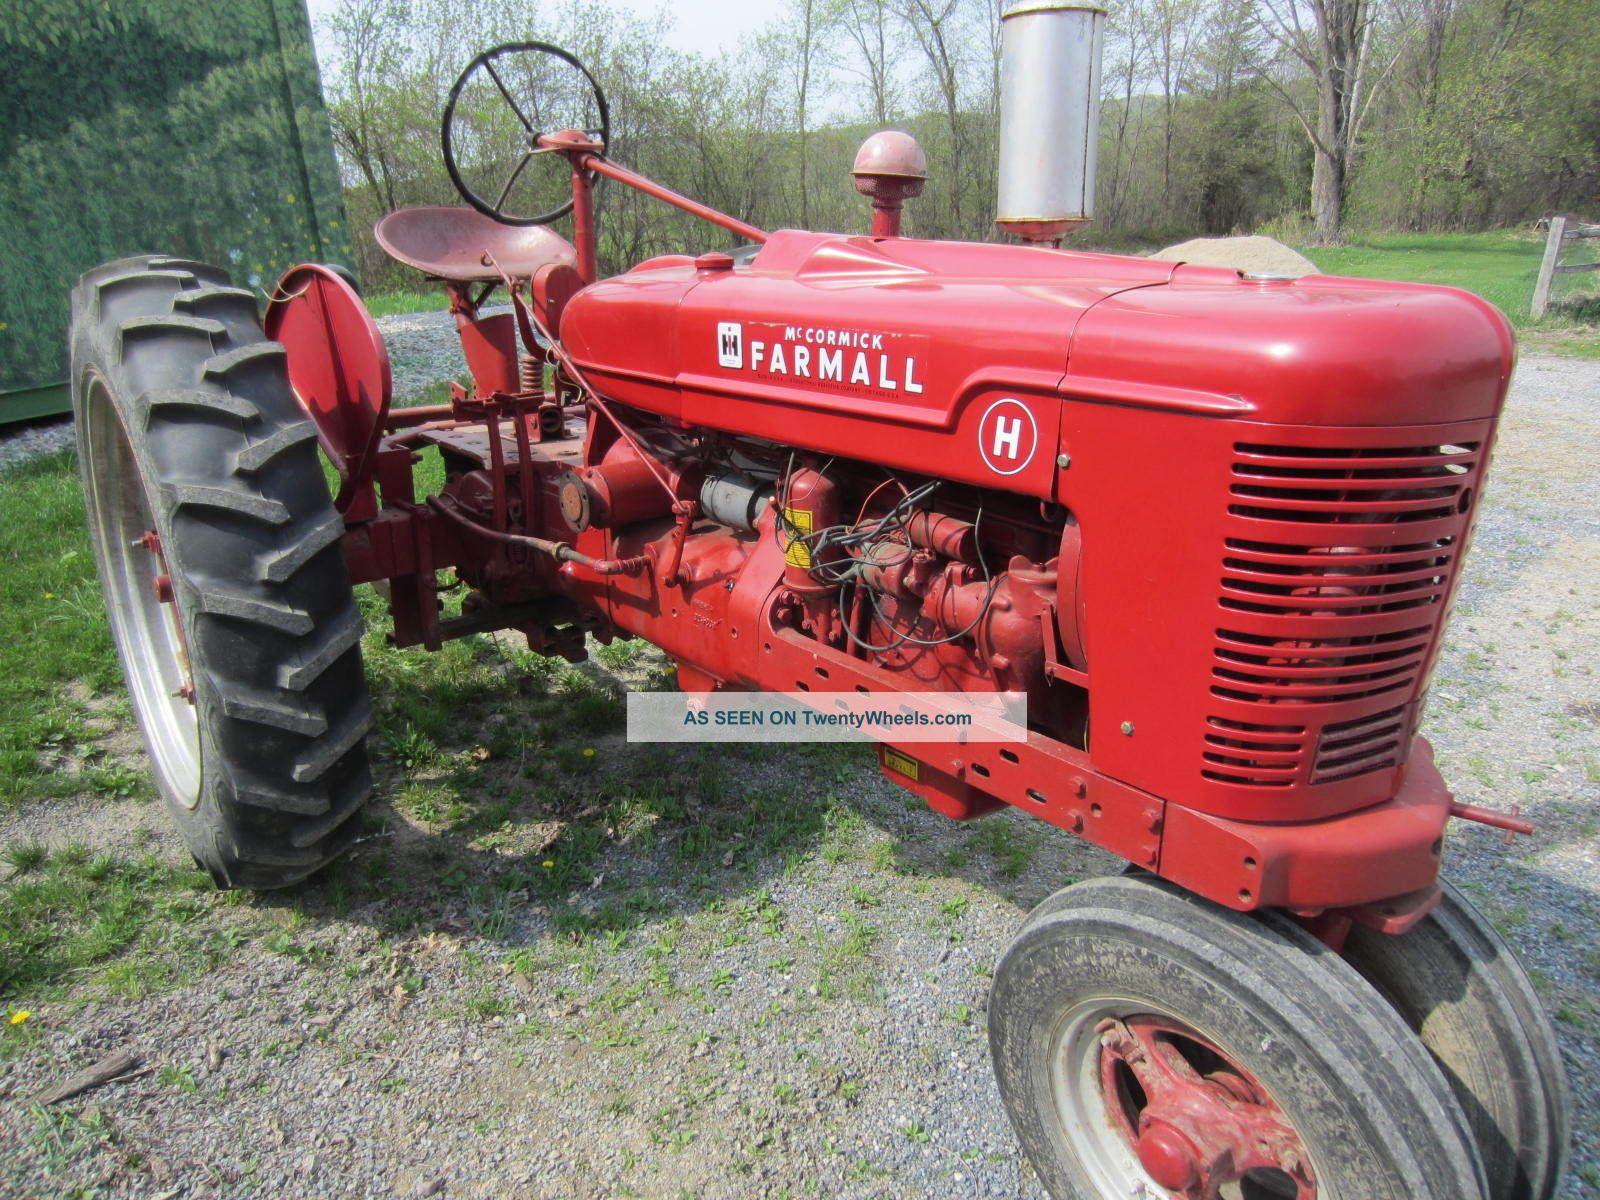 Farmall Tractor Models : Farmall tractor model h